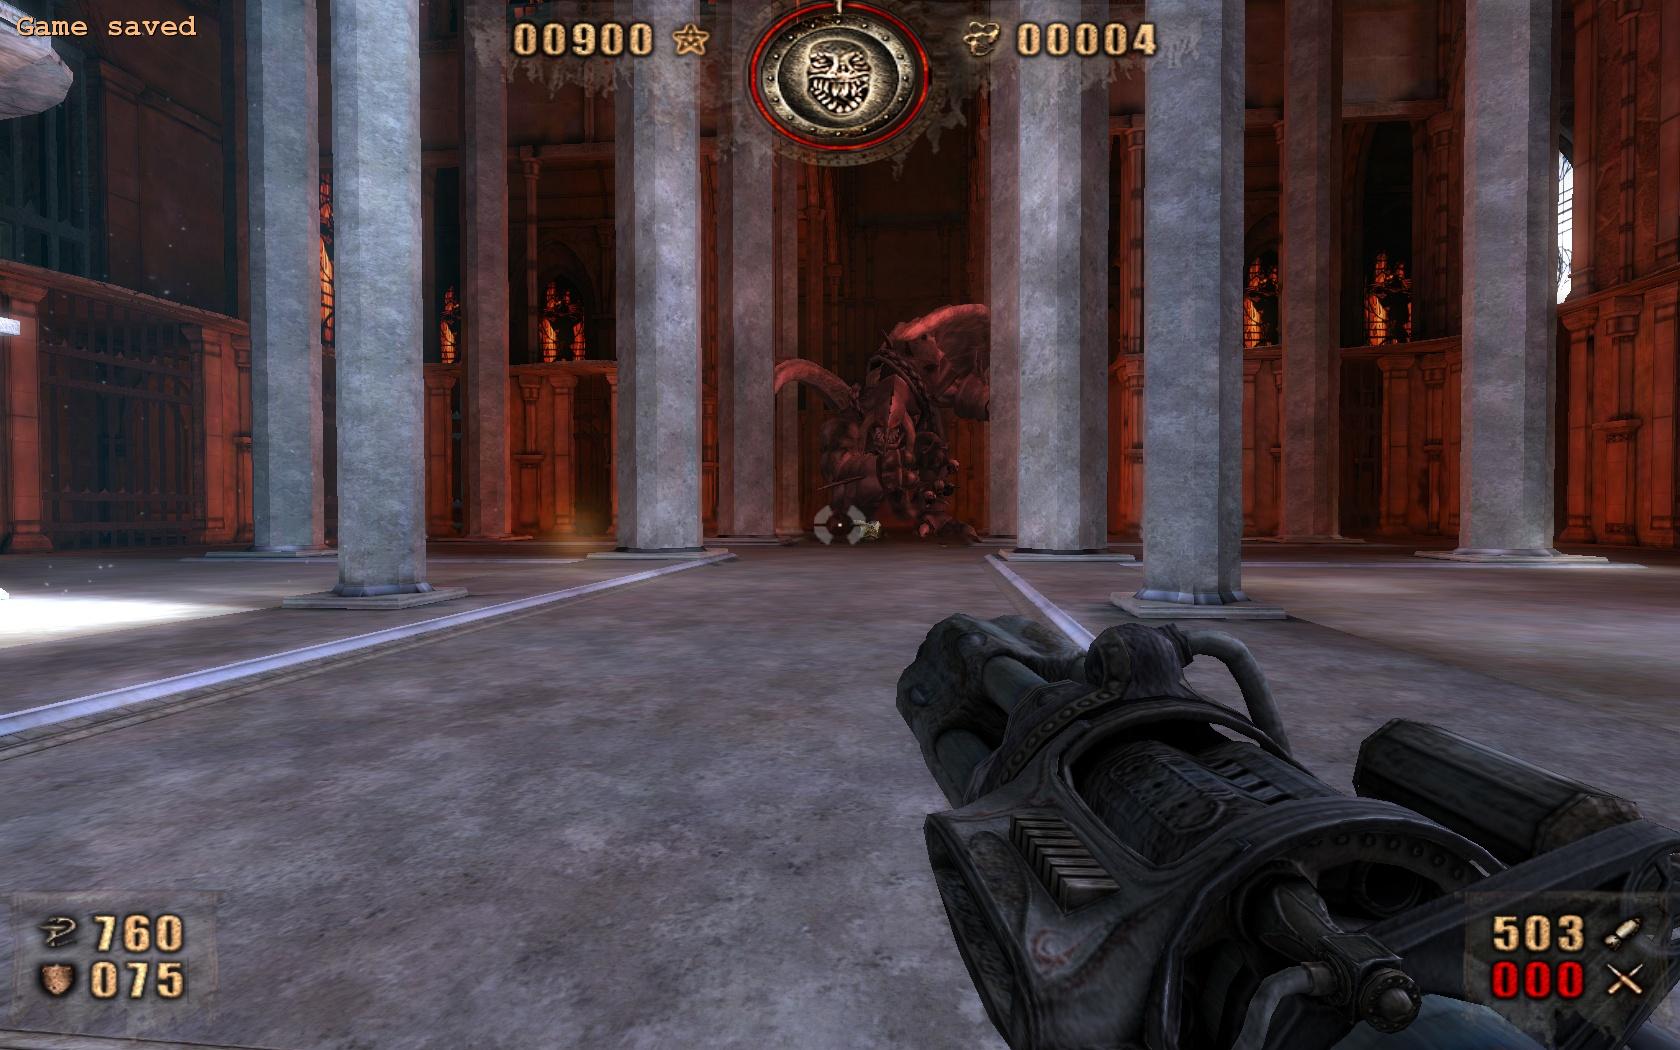 Скриншоты из игры Painkiller Redemption.